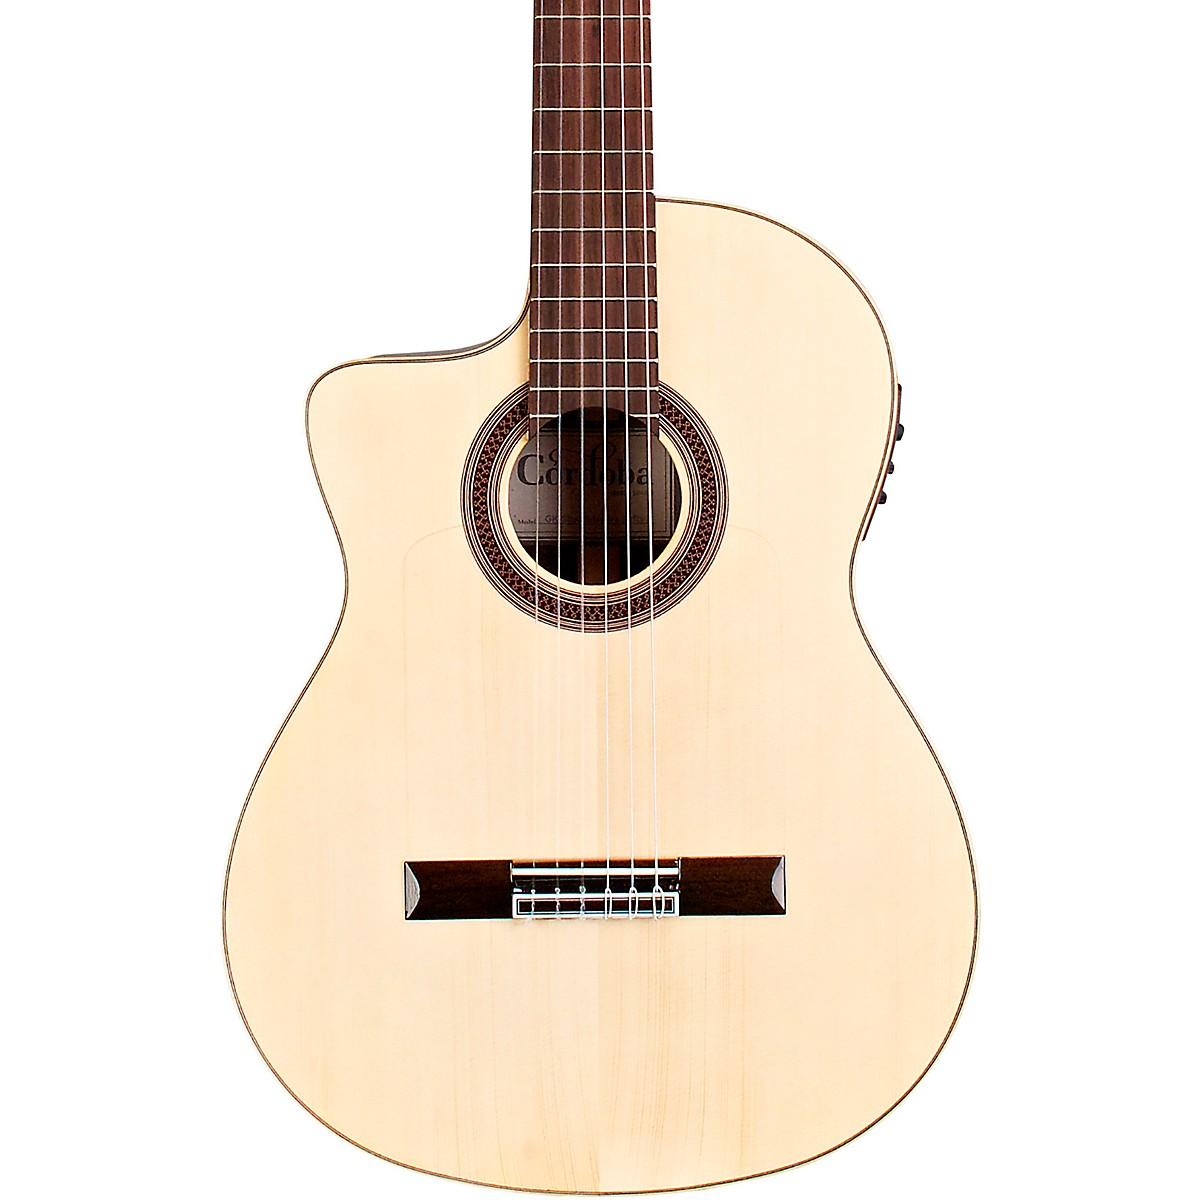 Cordoba GK Studio Negra Left-Handed Flamenco Acoustic-Electric Guitar